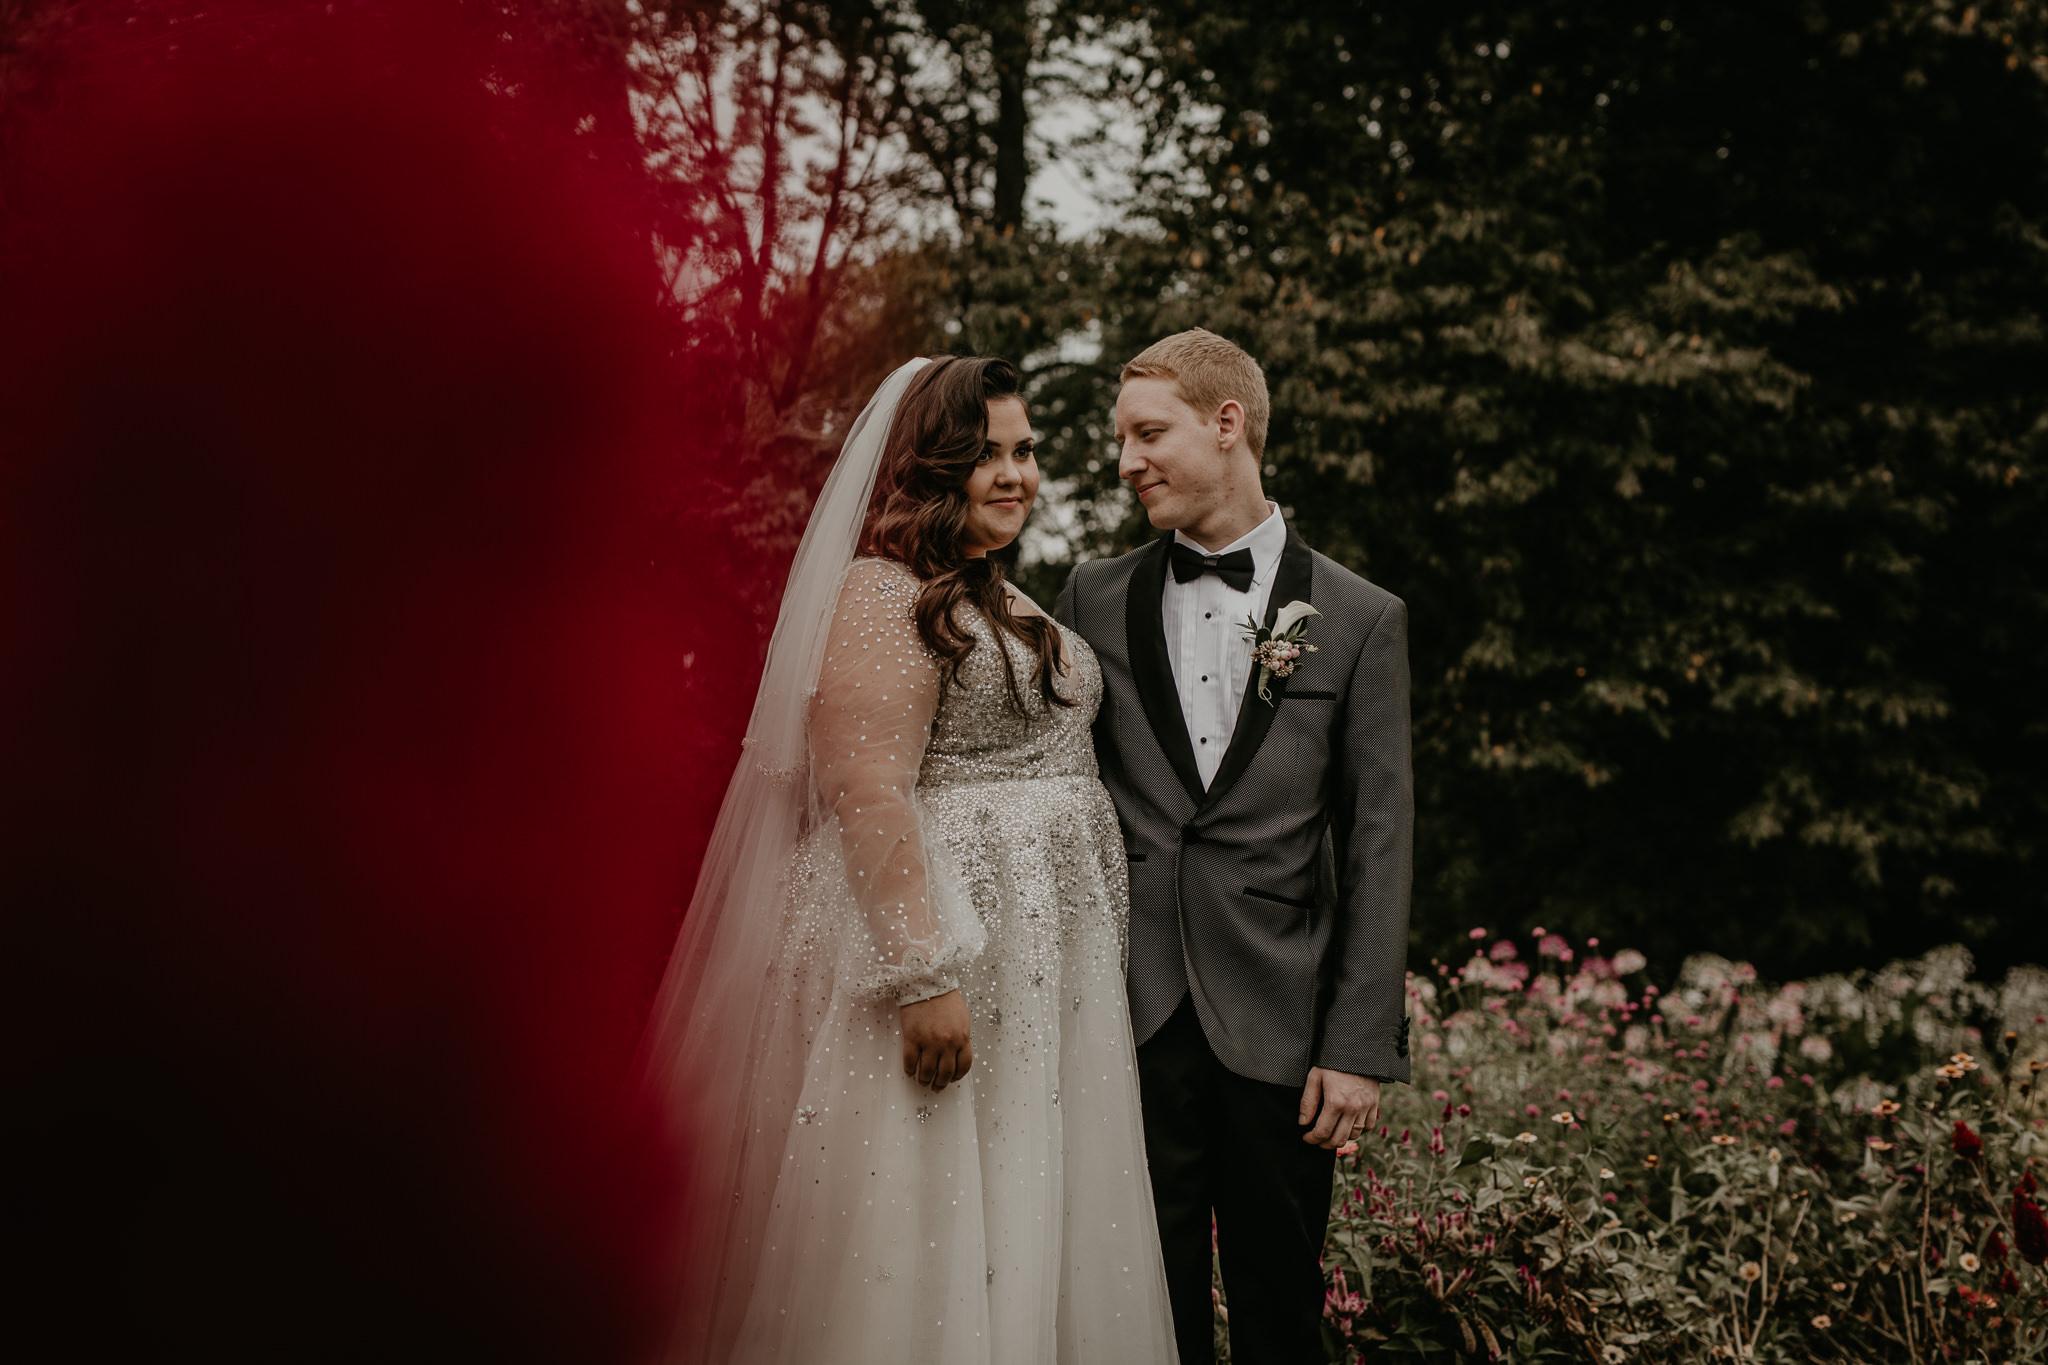 H+A_Hartford_Connecticut_RoseGarden_Wedding046.jpg